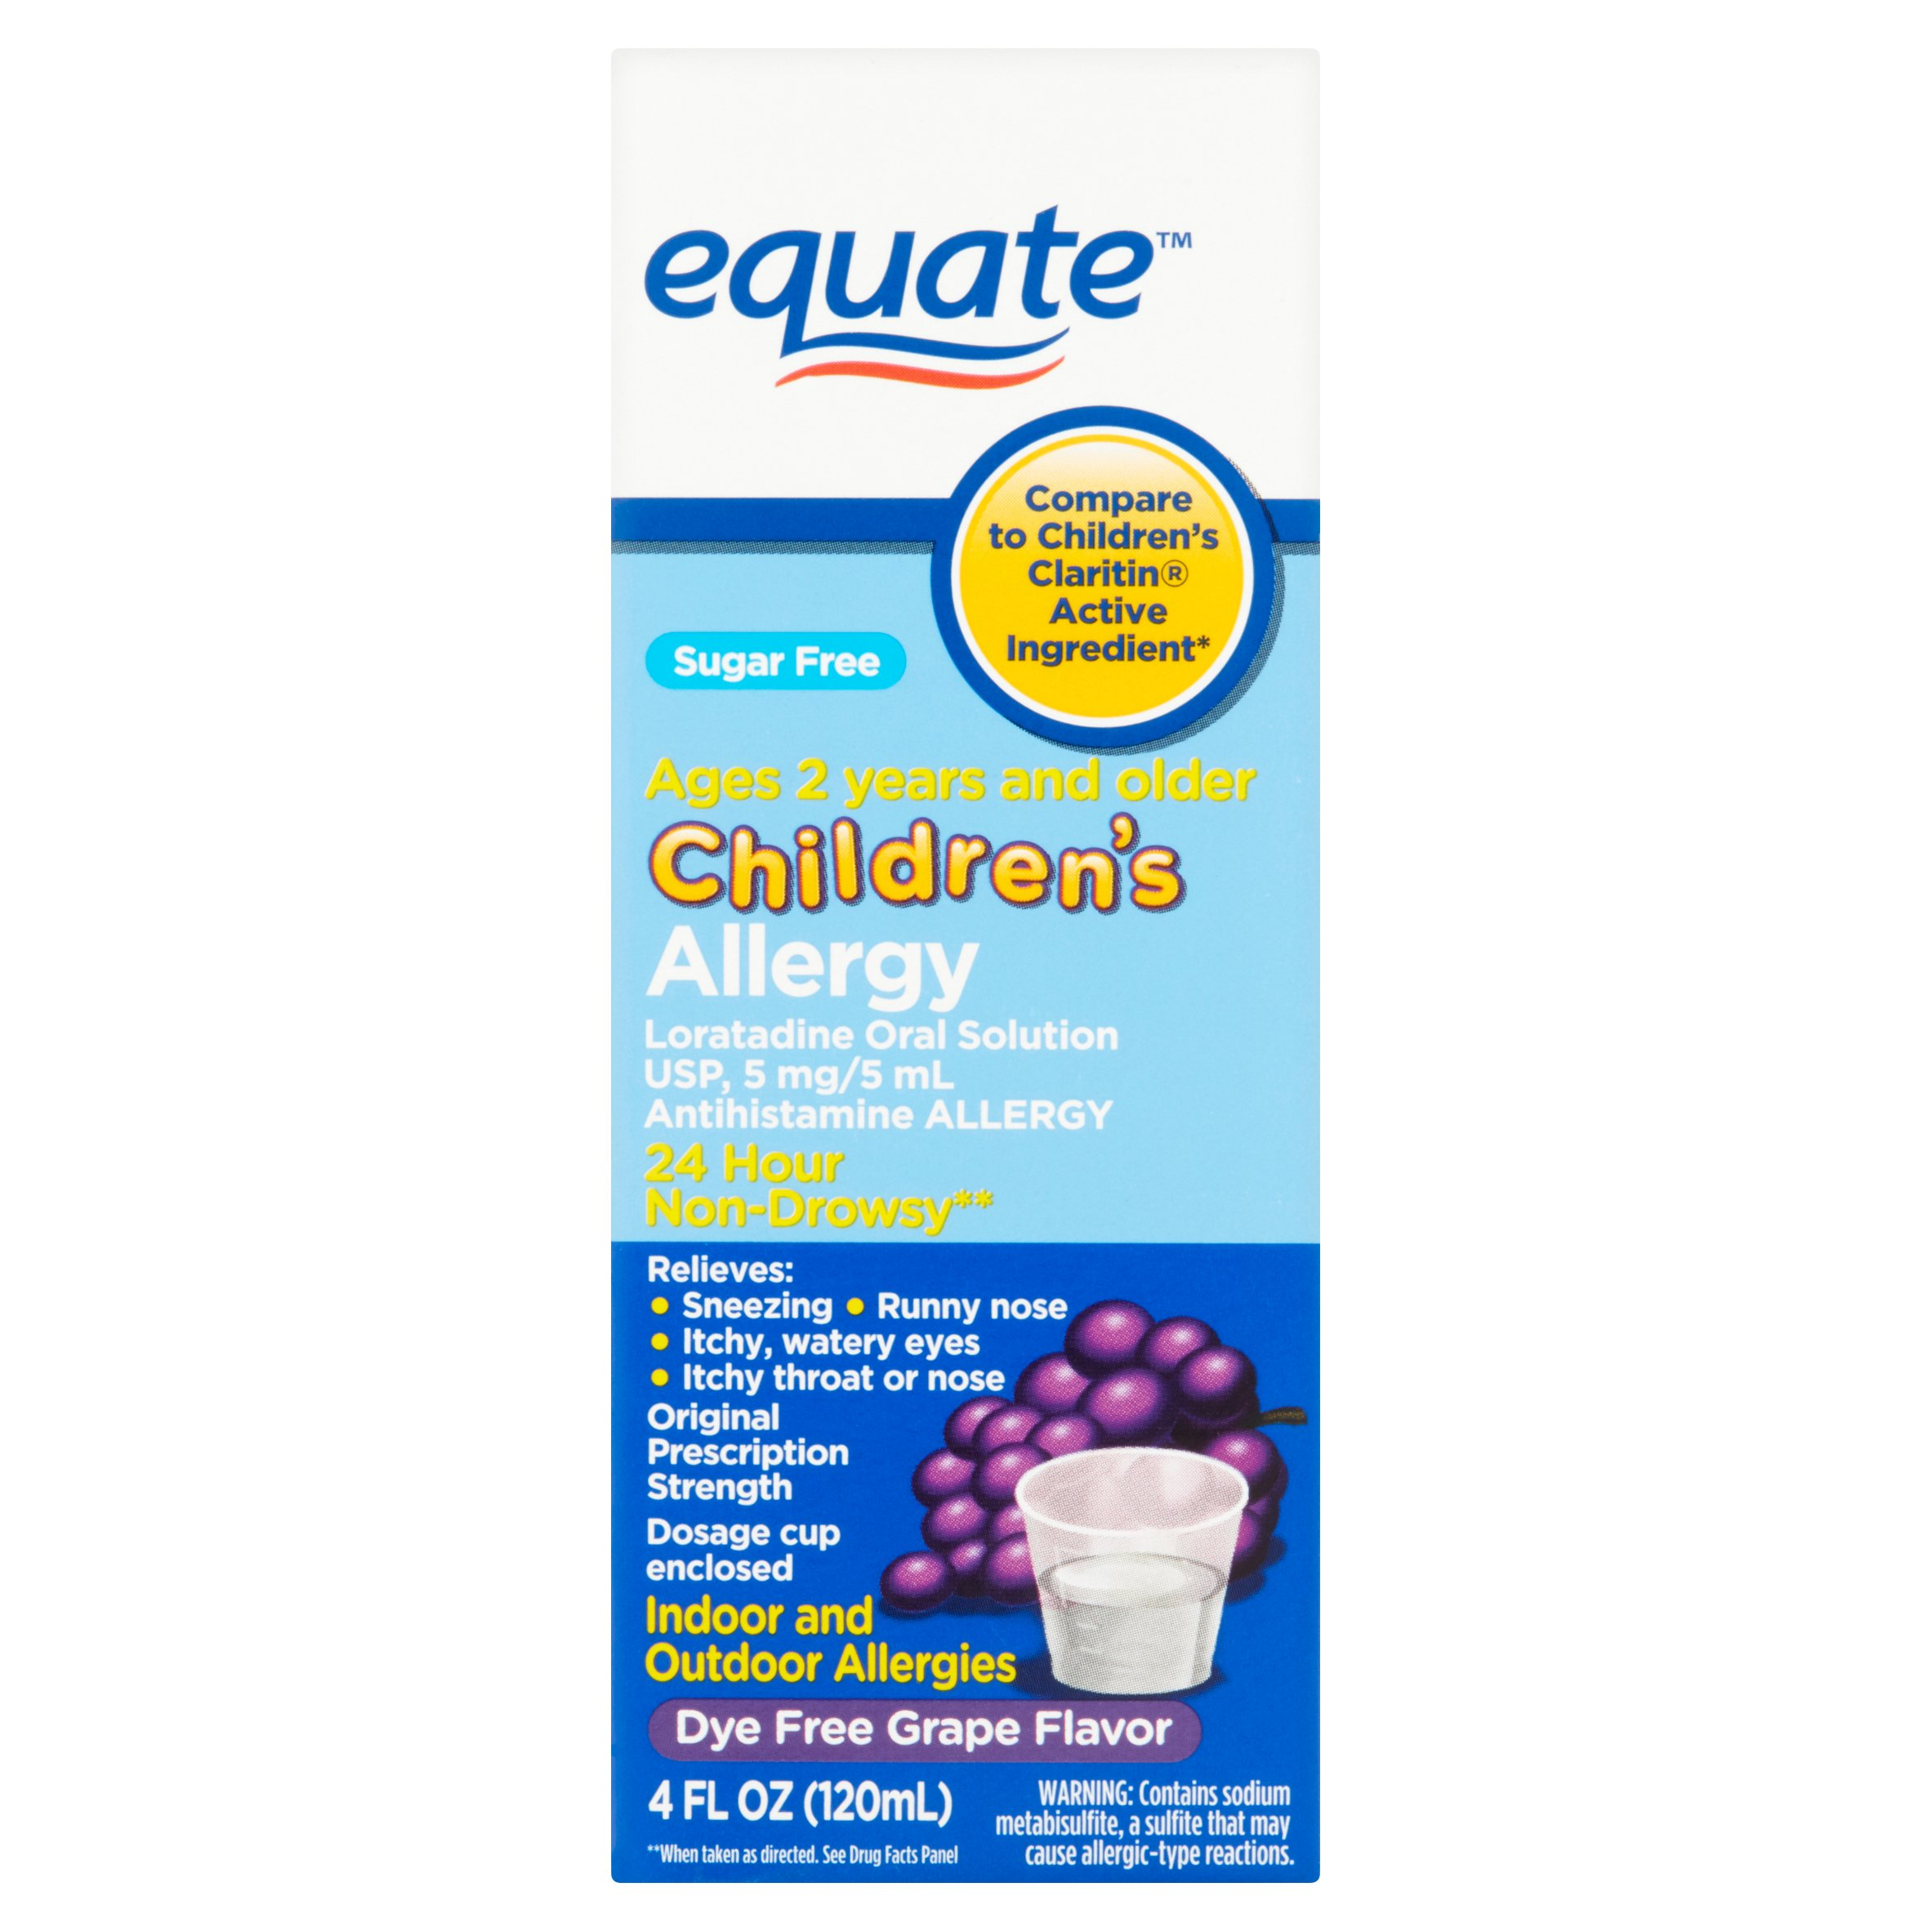 Equate Sugar Free Children's Allergy Relief Loratadine Dye-Free Grape Suspension, 4 Oz